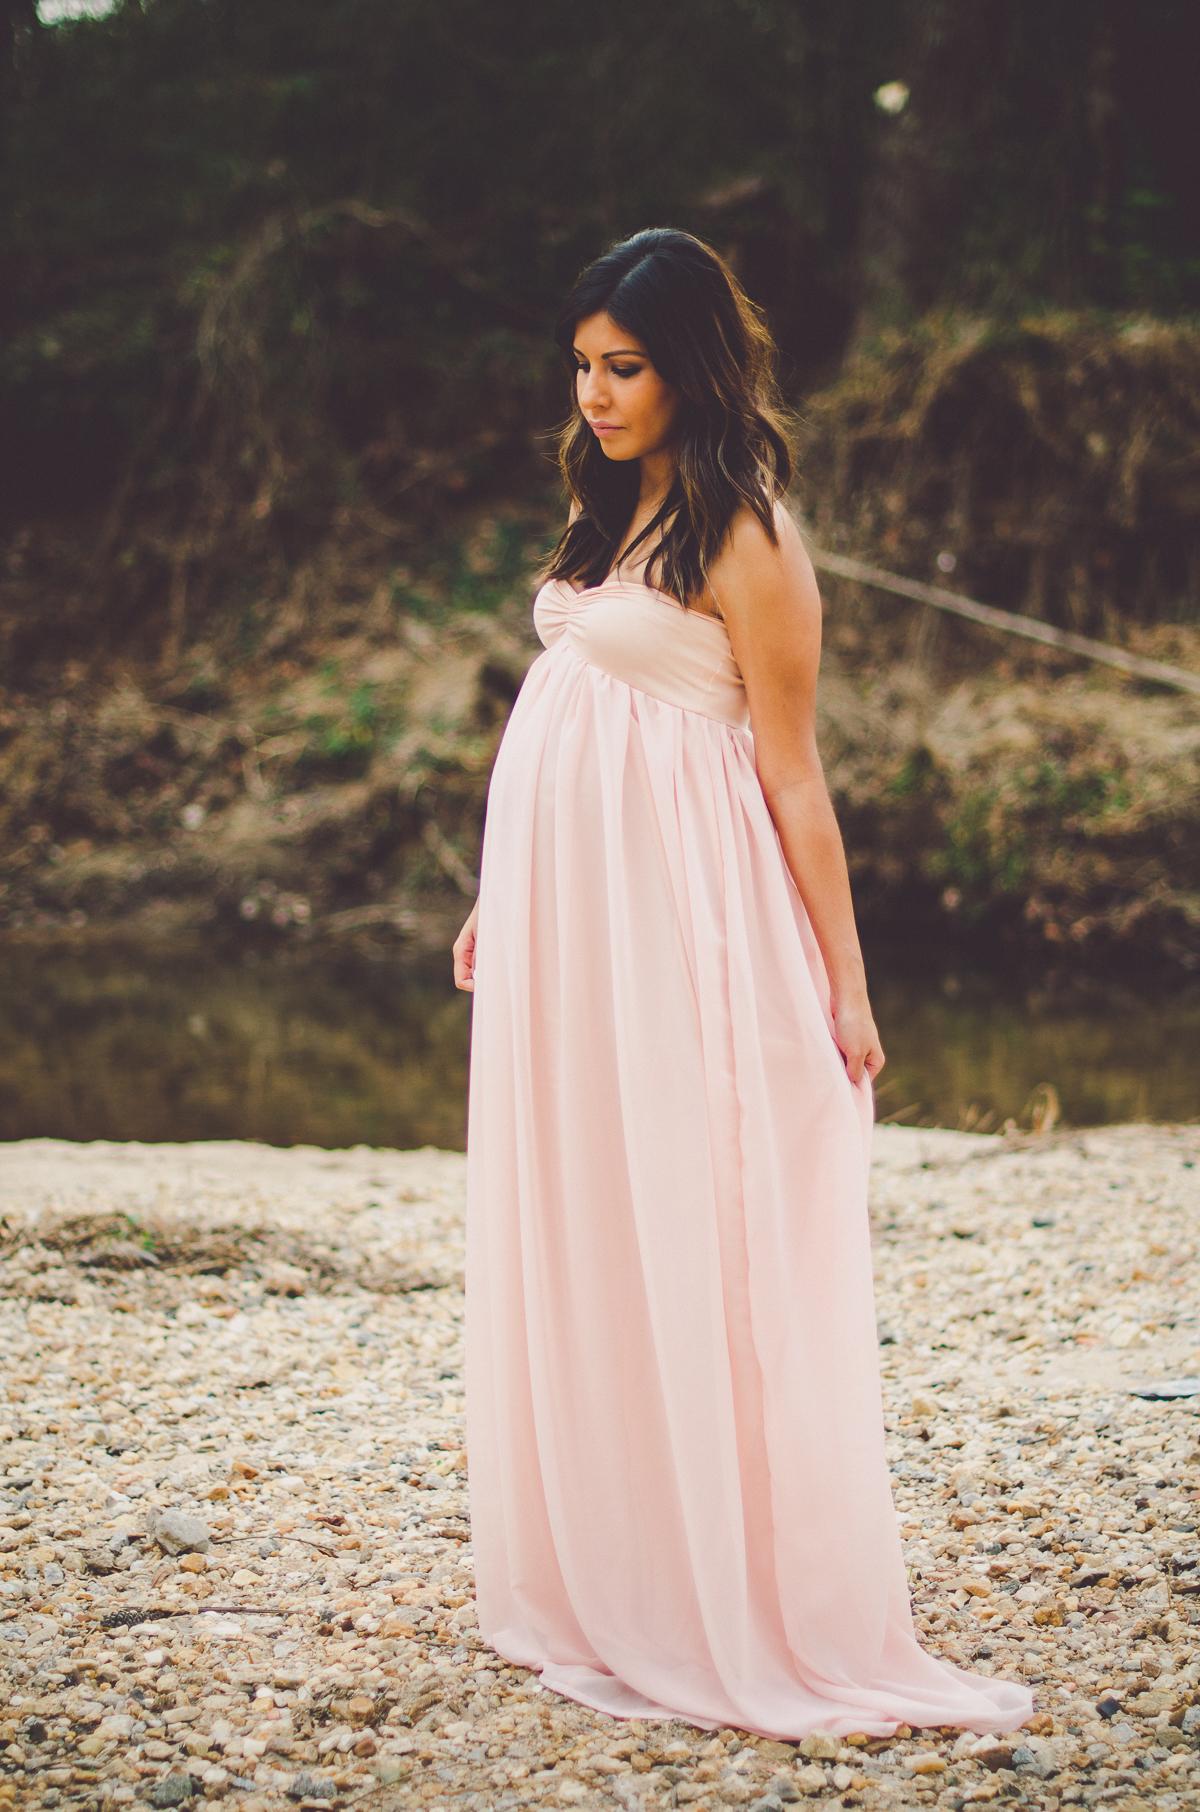 esmeralda-john-kelley-raye-atlanta-lifestyle-photographer-9.jpg